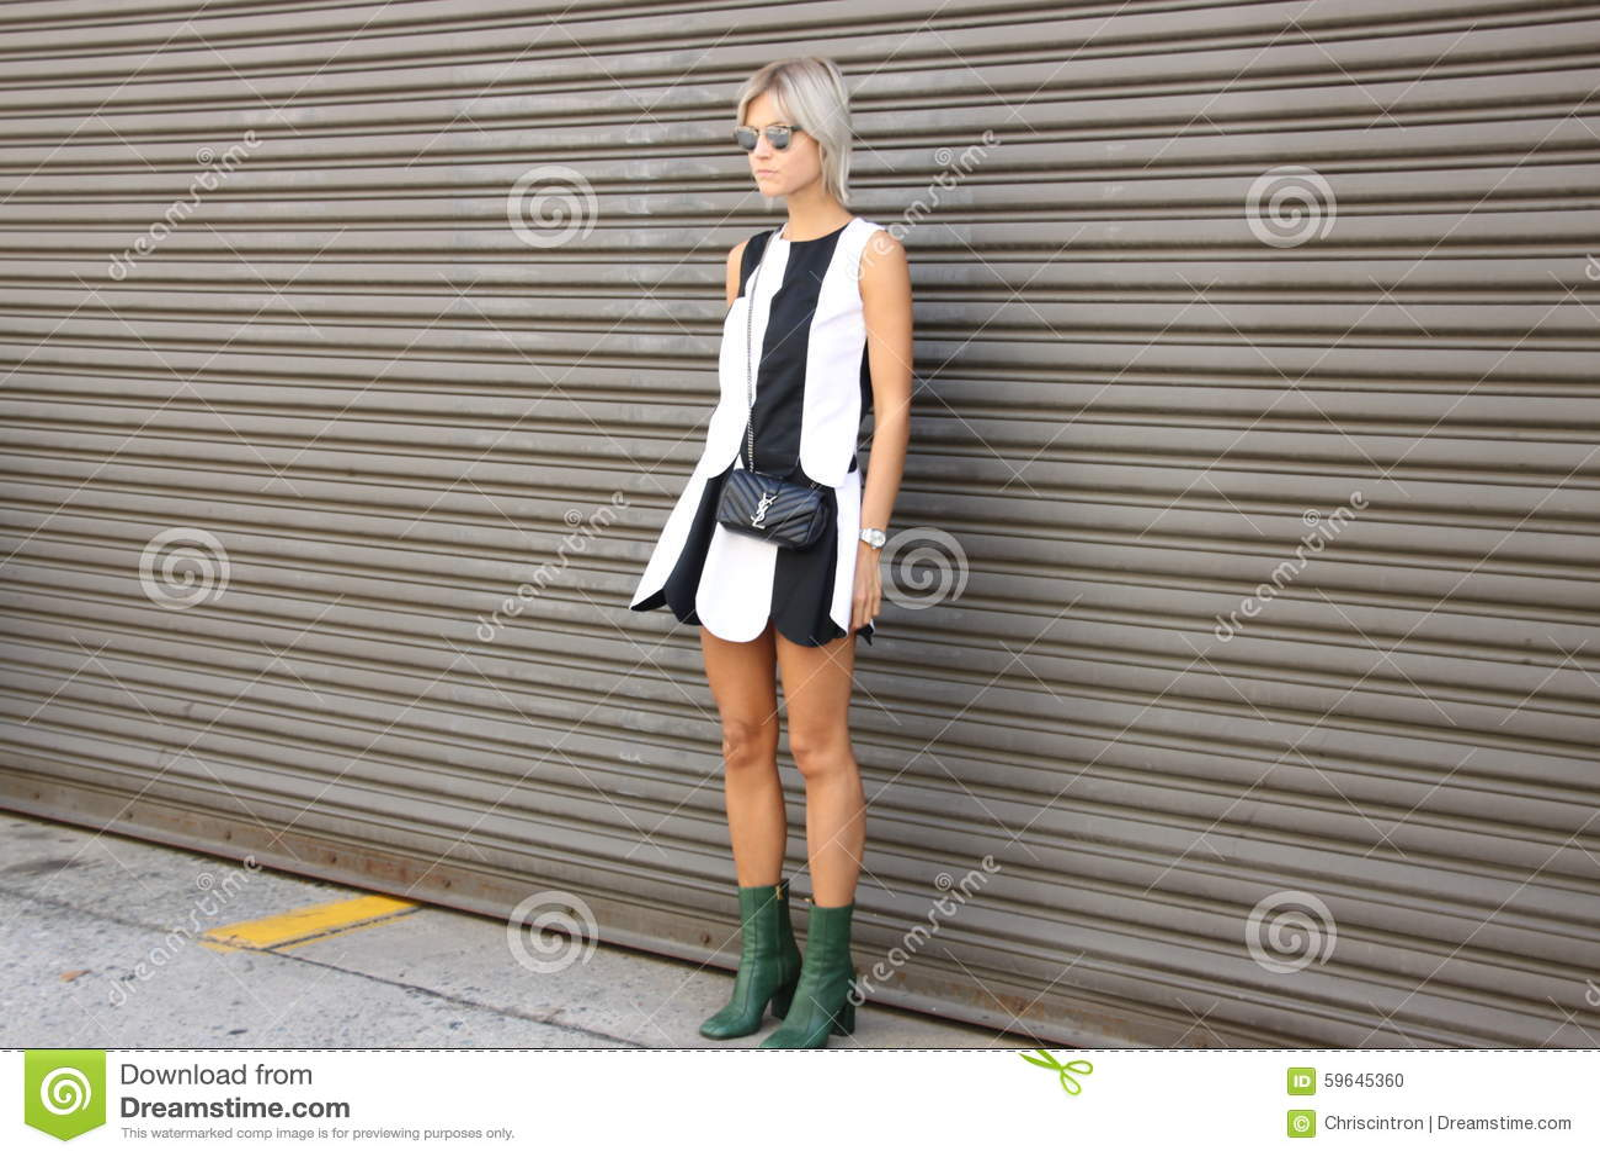 Street Style Spring 2016 New York City Fashionweek Editorial Image Image 59645360